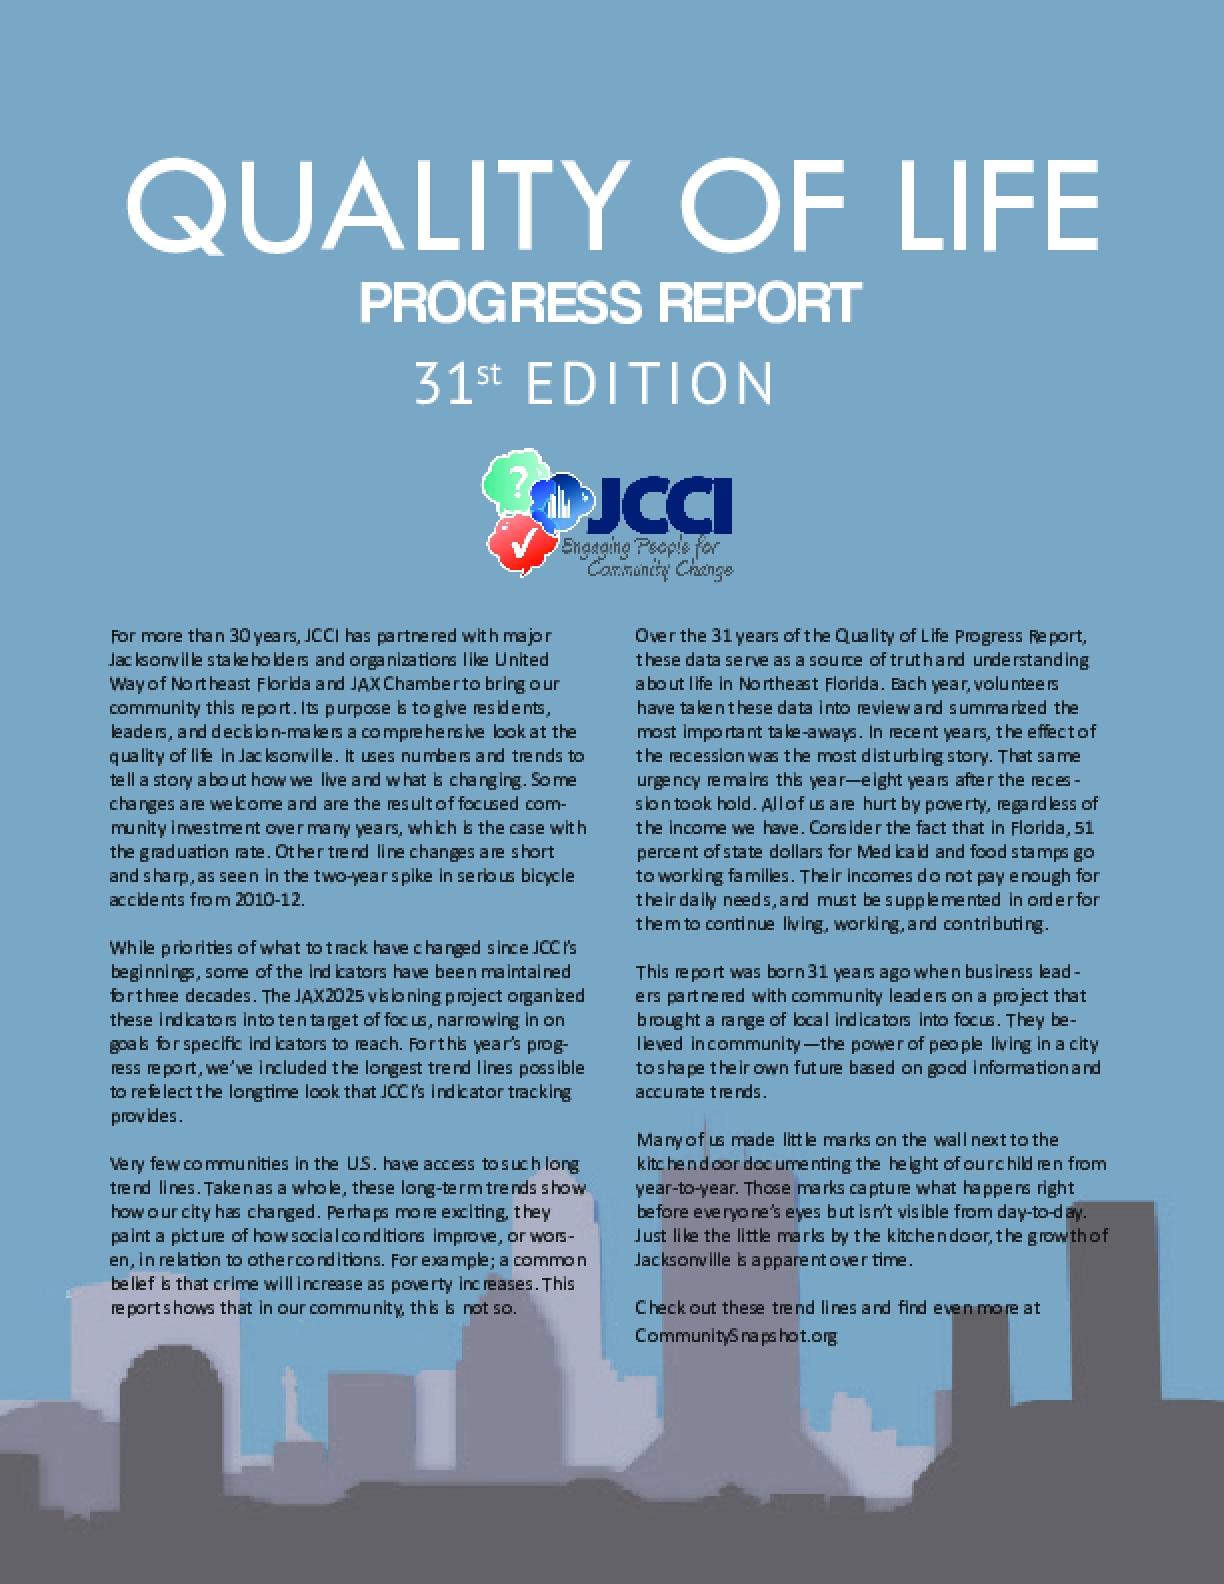 Quality of Life Progress Report 31st Edition